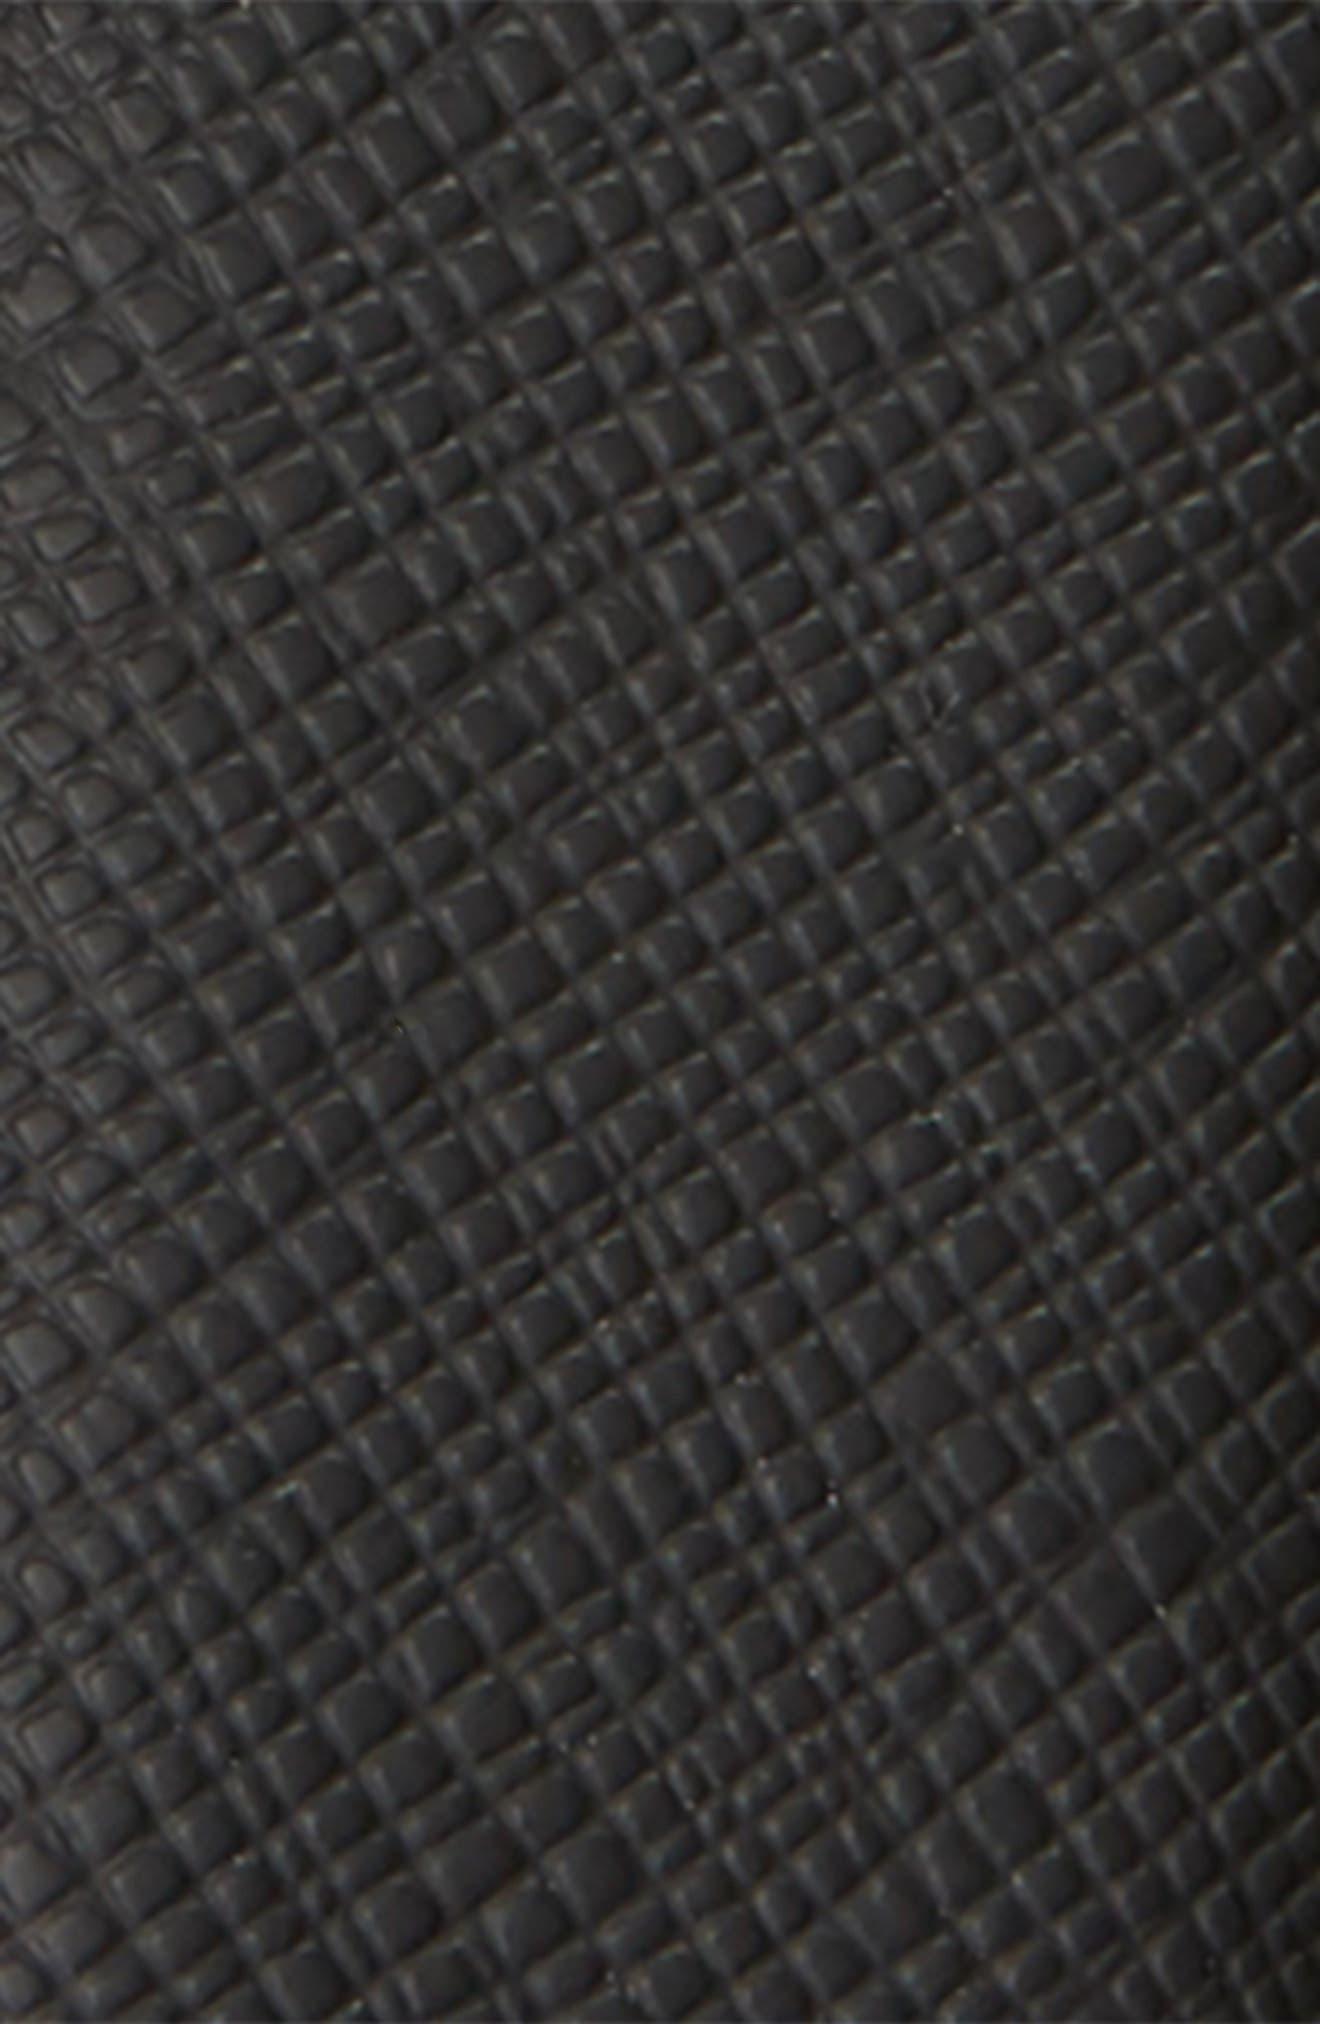 MONTBLANC, Horseshoe Buckle Reversible Sartorial Leather Belt, Alternate thumbnail 3, color, BLACK/ BROWN